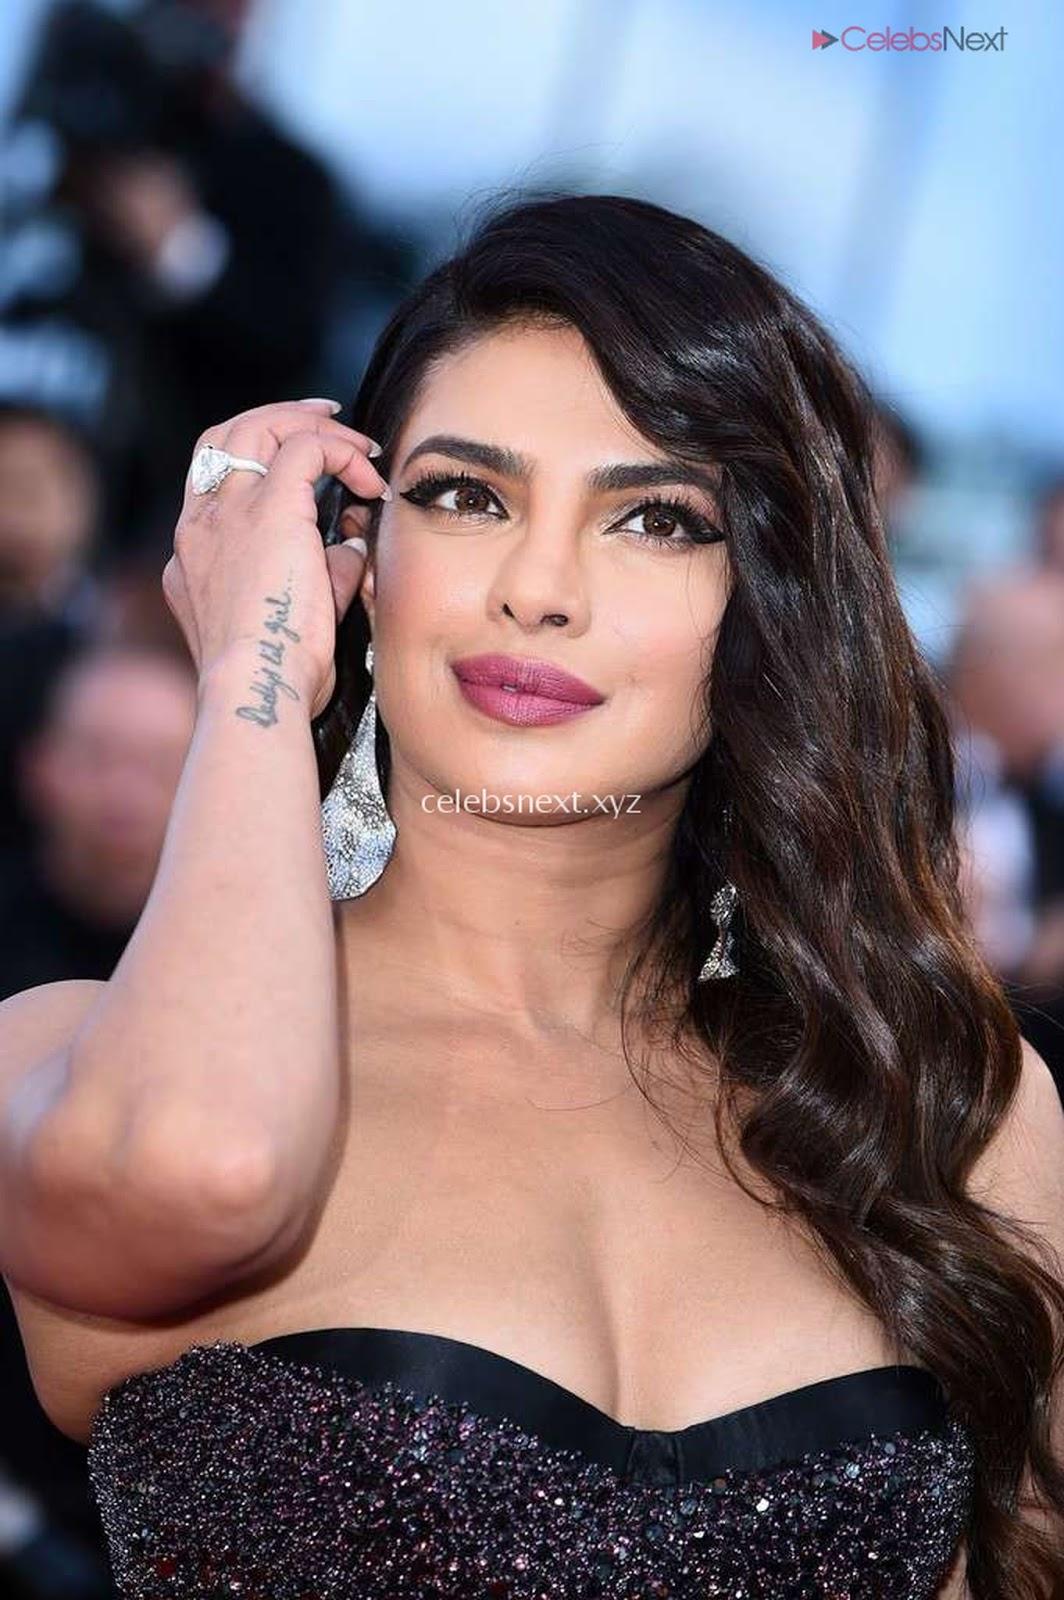 Priyanka Chopra Rocks the Rocketman Screening Cannes ina Sizzling Dark Gown- CEleBsNext.XYZ-Exclusive